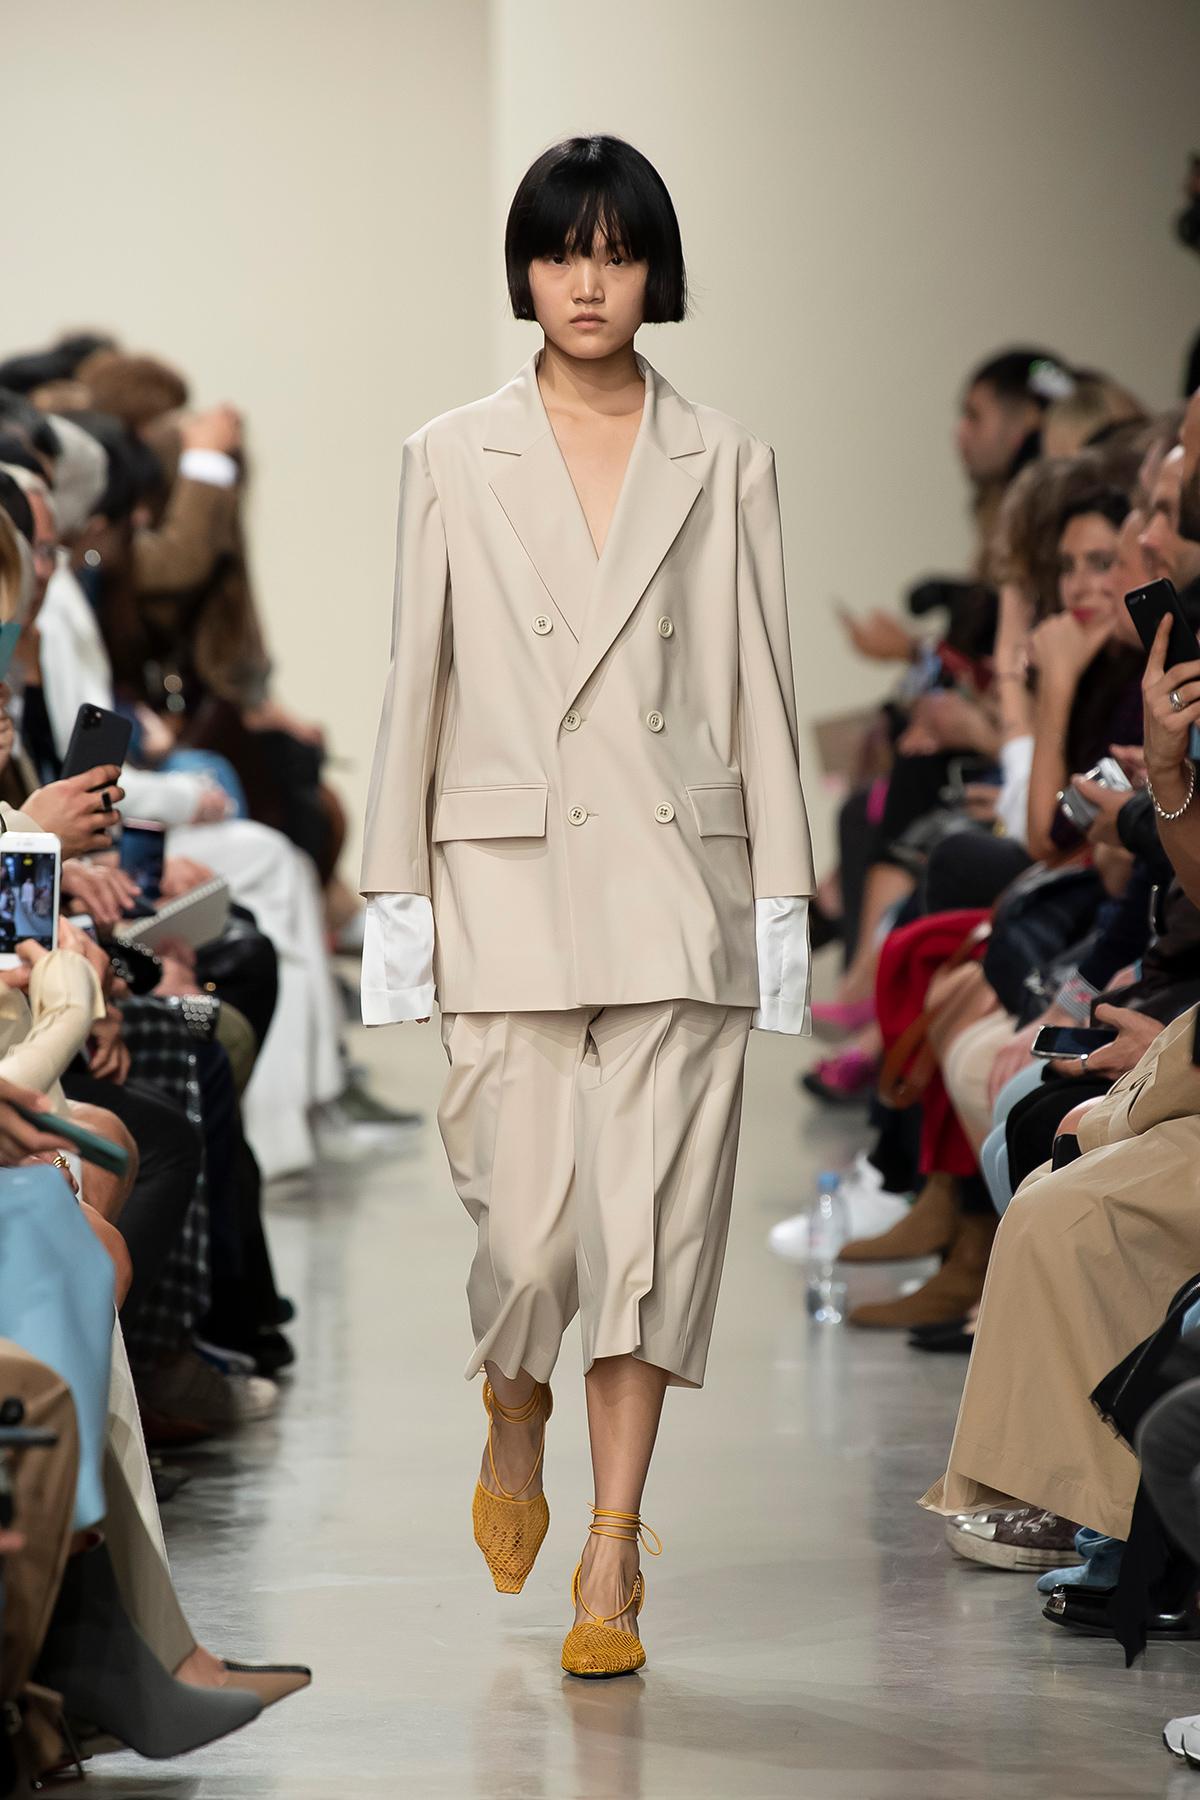 LOOK 35 Blazer PARILYSE Trousers PIROLI